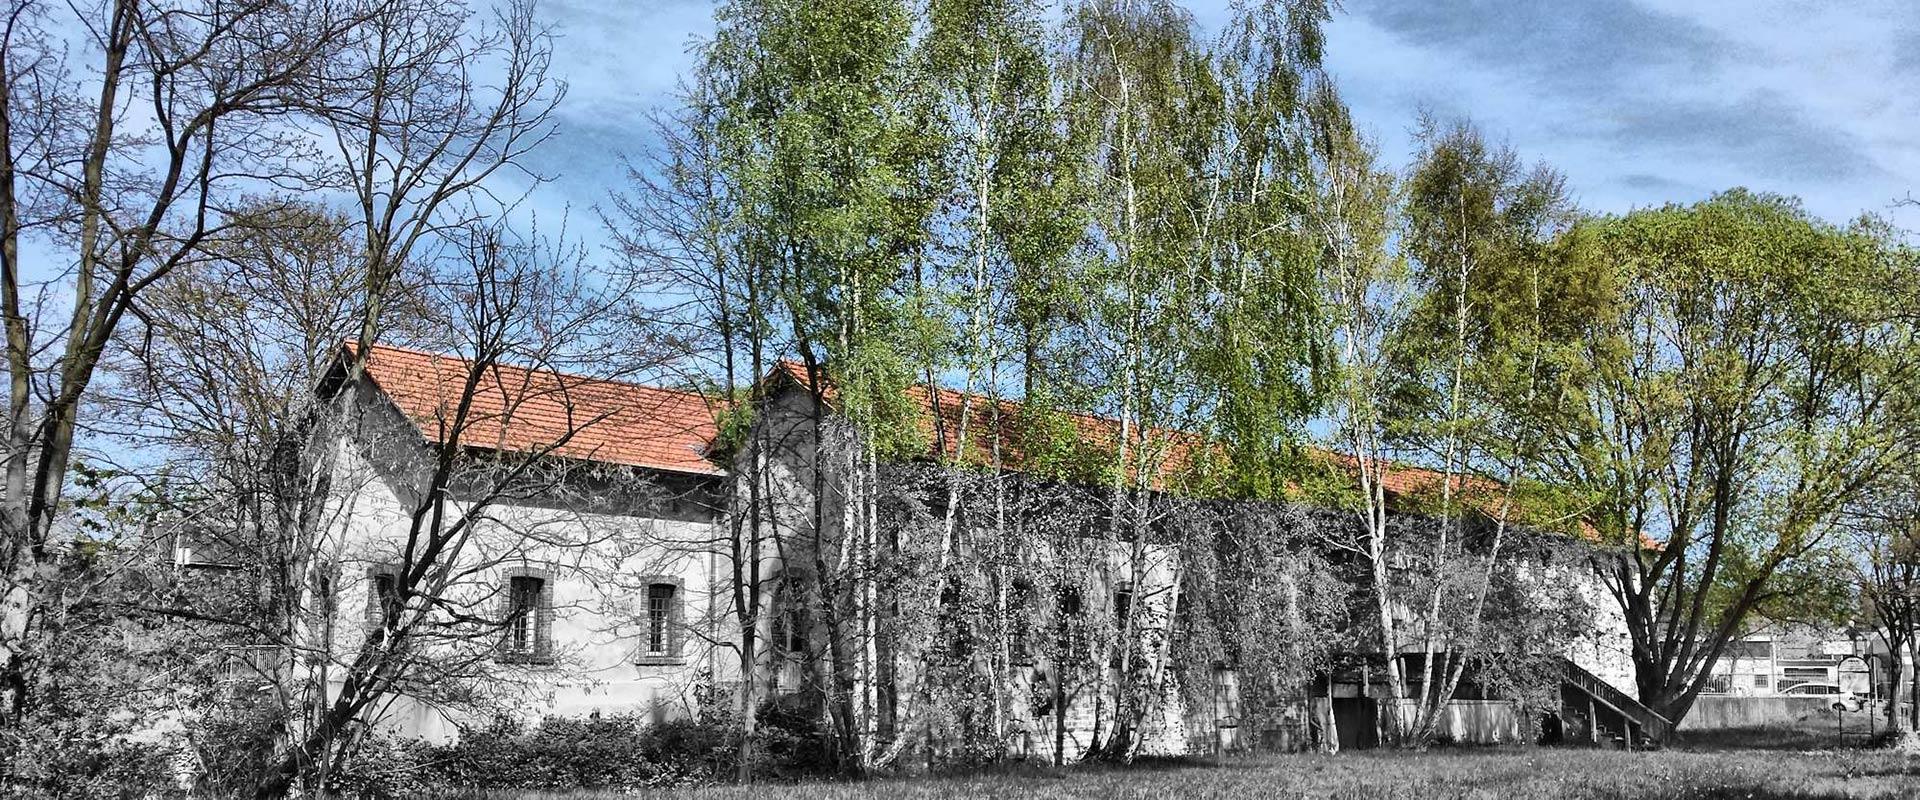 th. hippchen GmbH - ALtes Pumpenhaus St. Ingbert